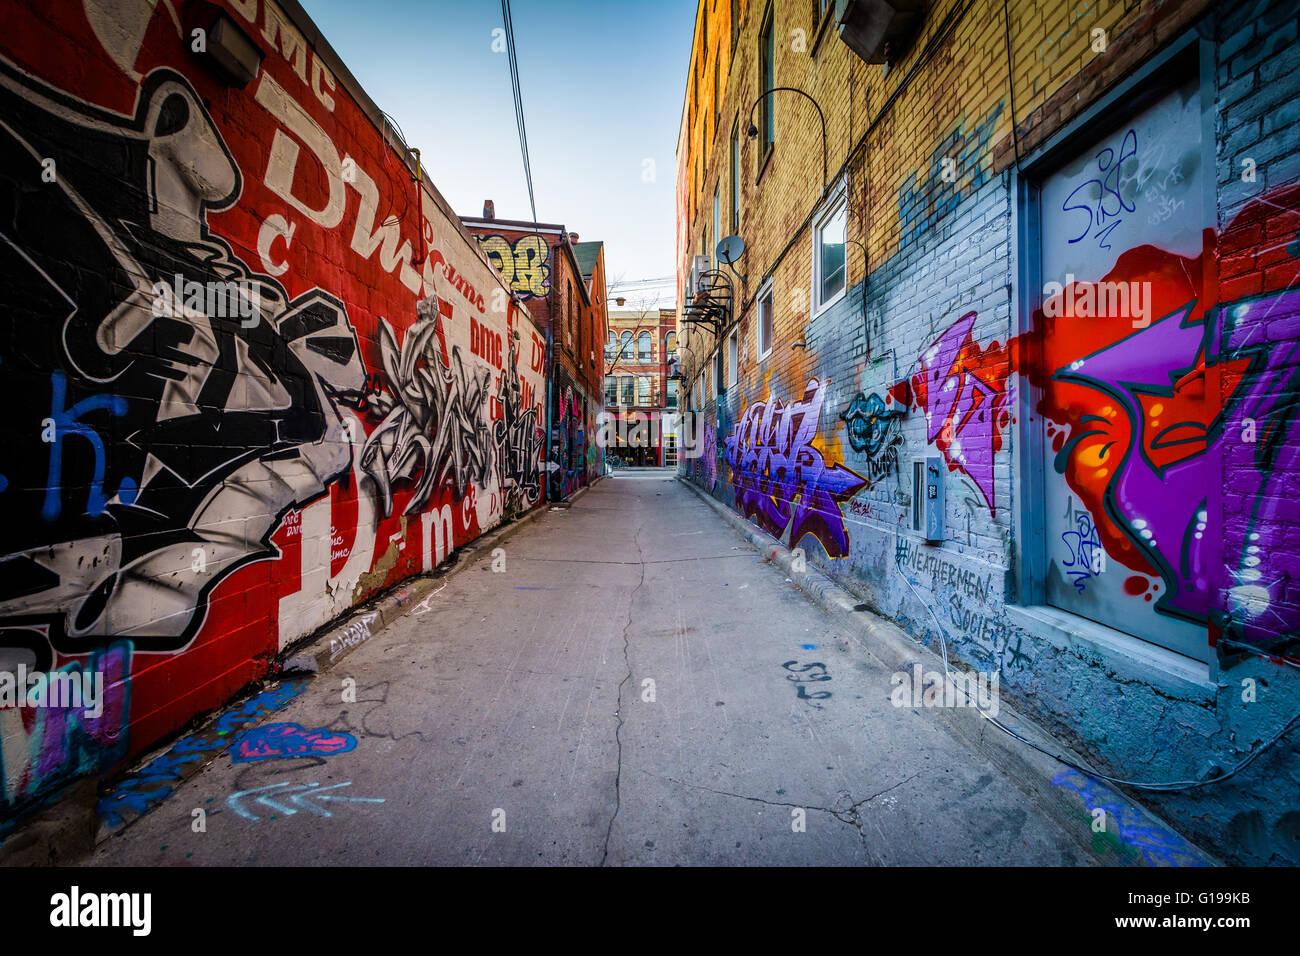 Graffiti wall toronto downtown - Street Art In Graffiti Alley In The Fashion District Of Toronto Ontario